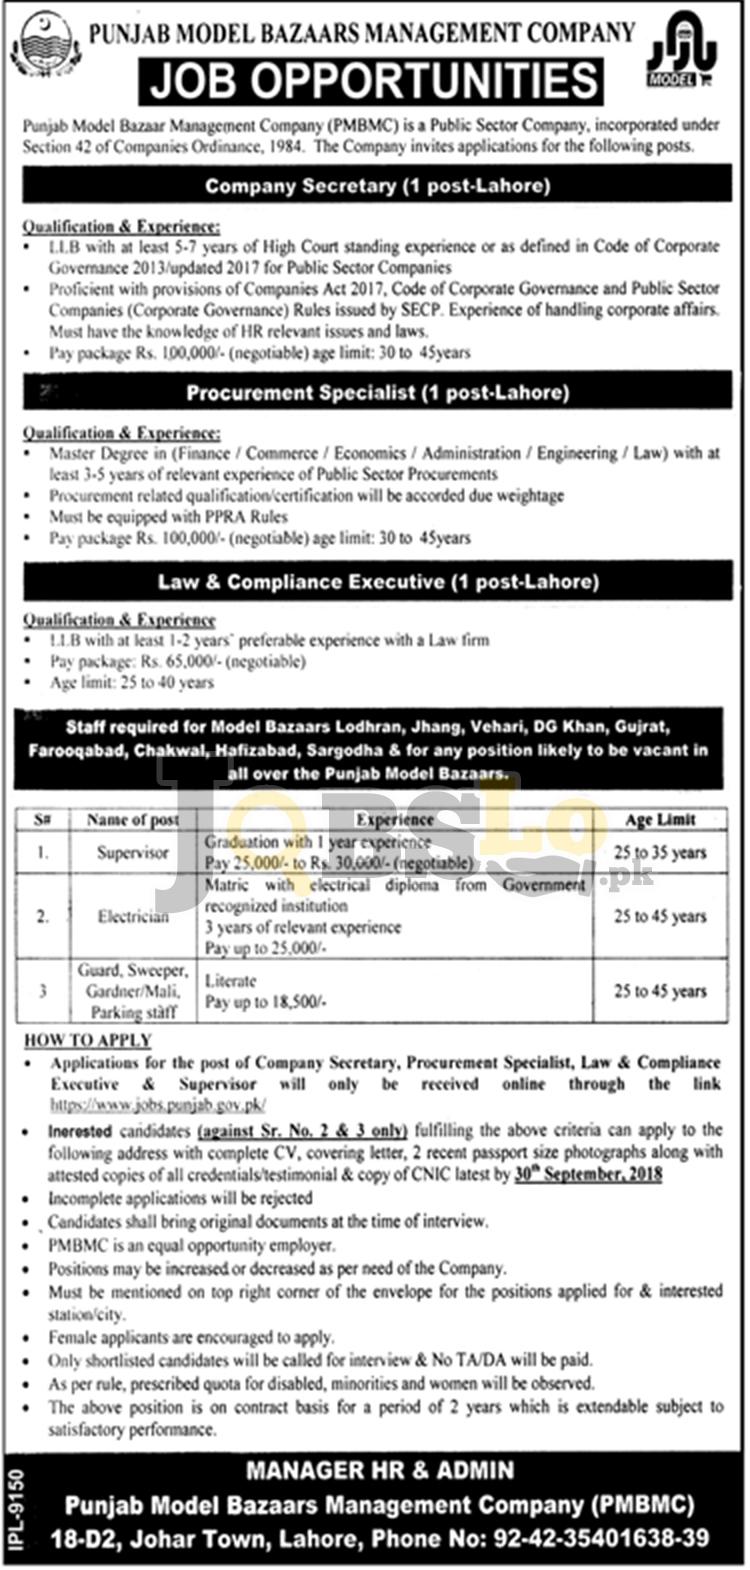 PMBMC Jobs 12 Sep 2018 Punjab Model Bazaars Management Company Apply Online